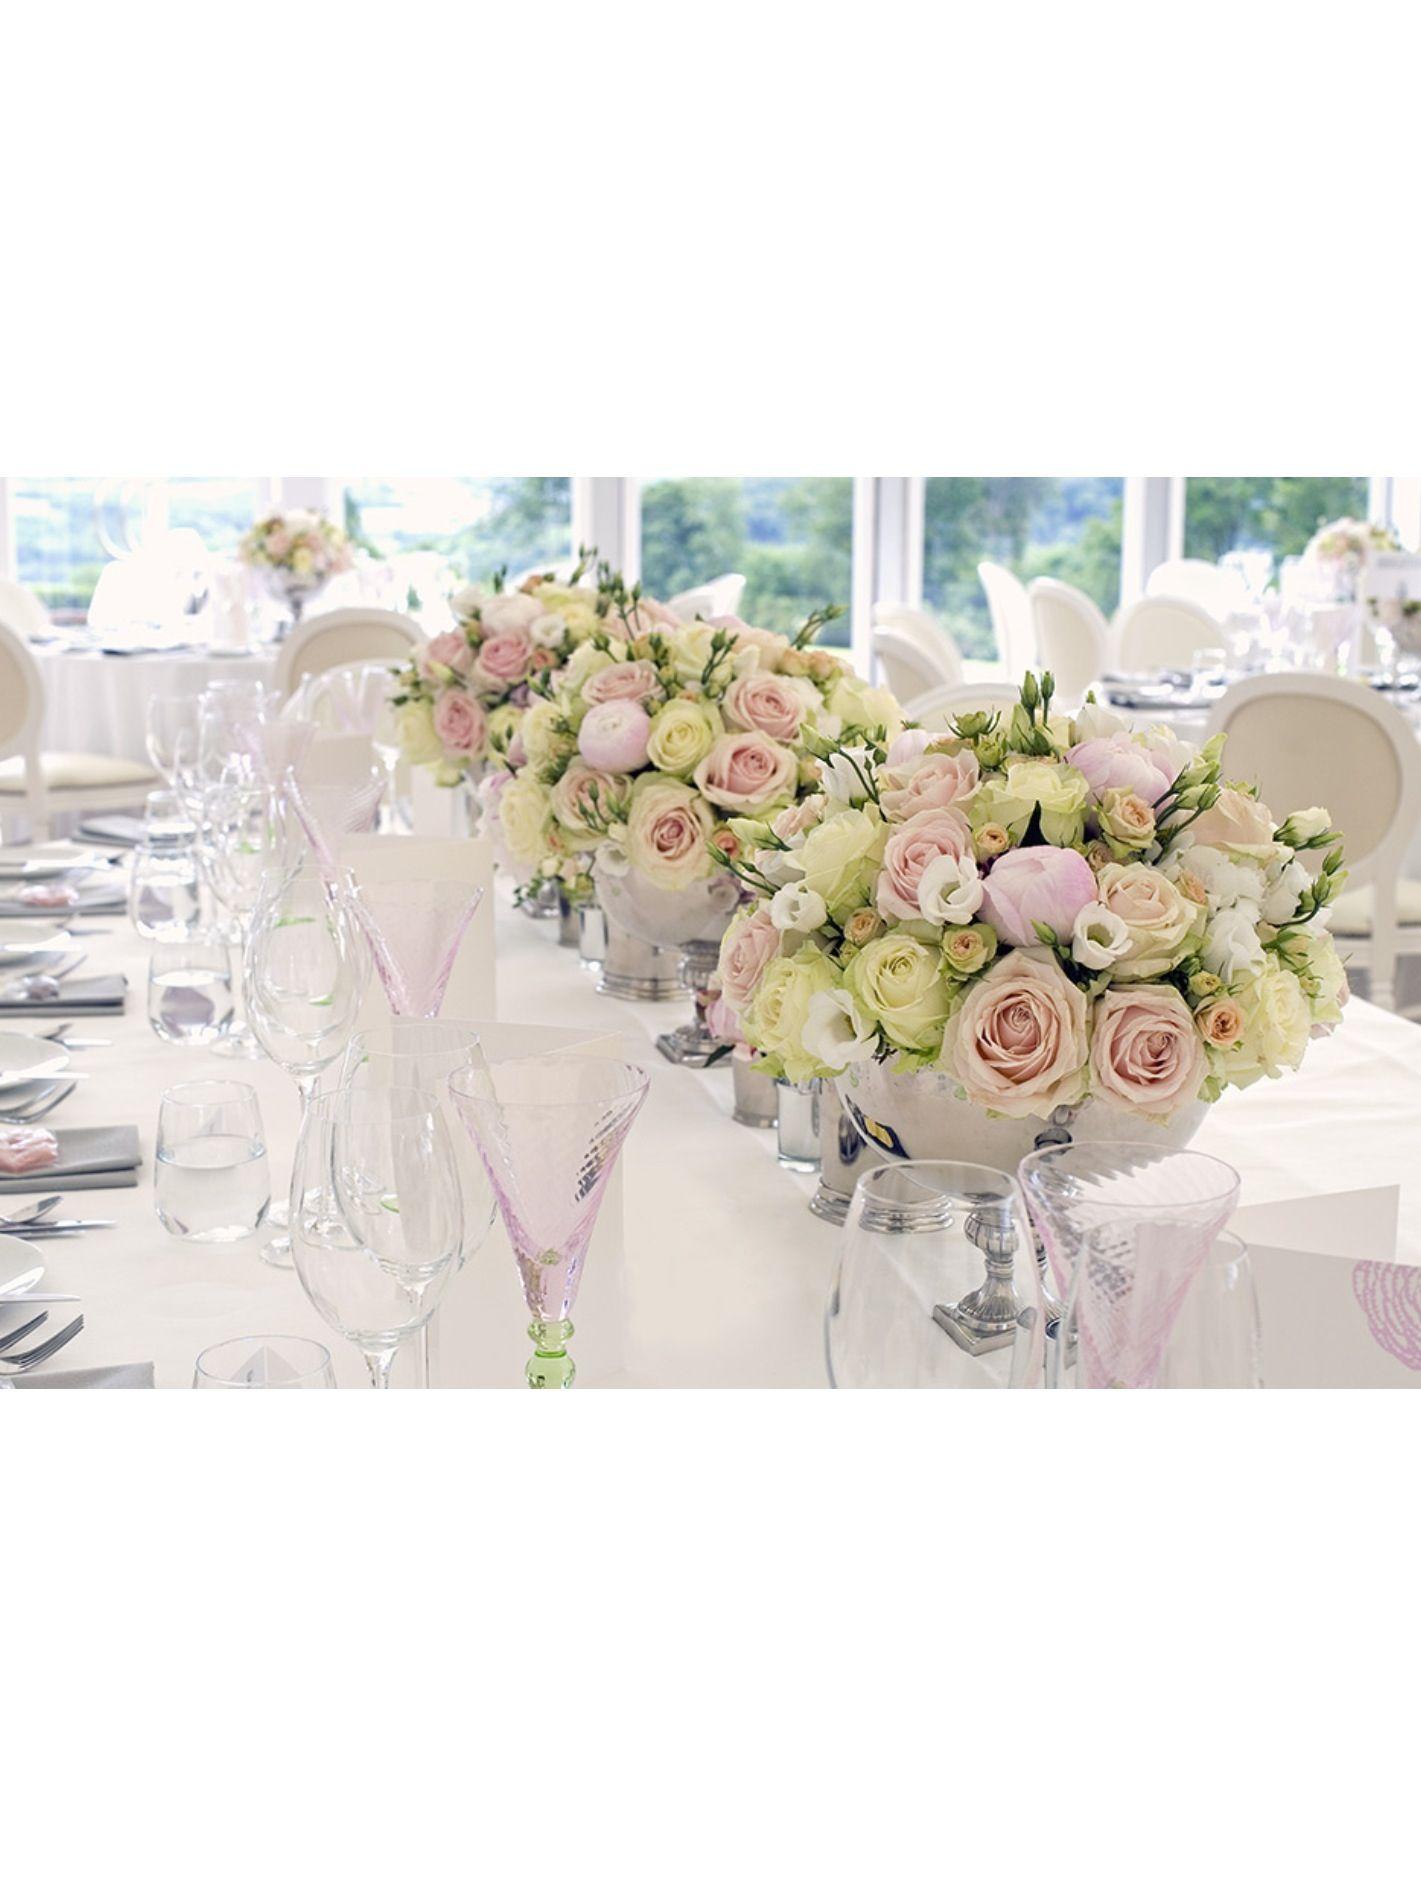 Phillipa Craddock   Floral arrangements   Pinterest   Glamorous ...